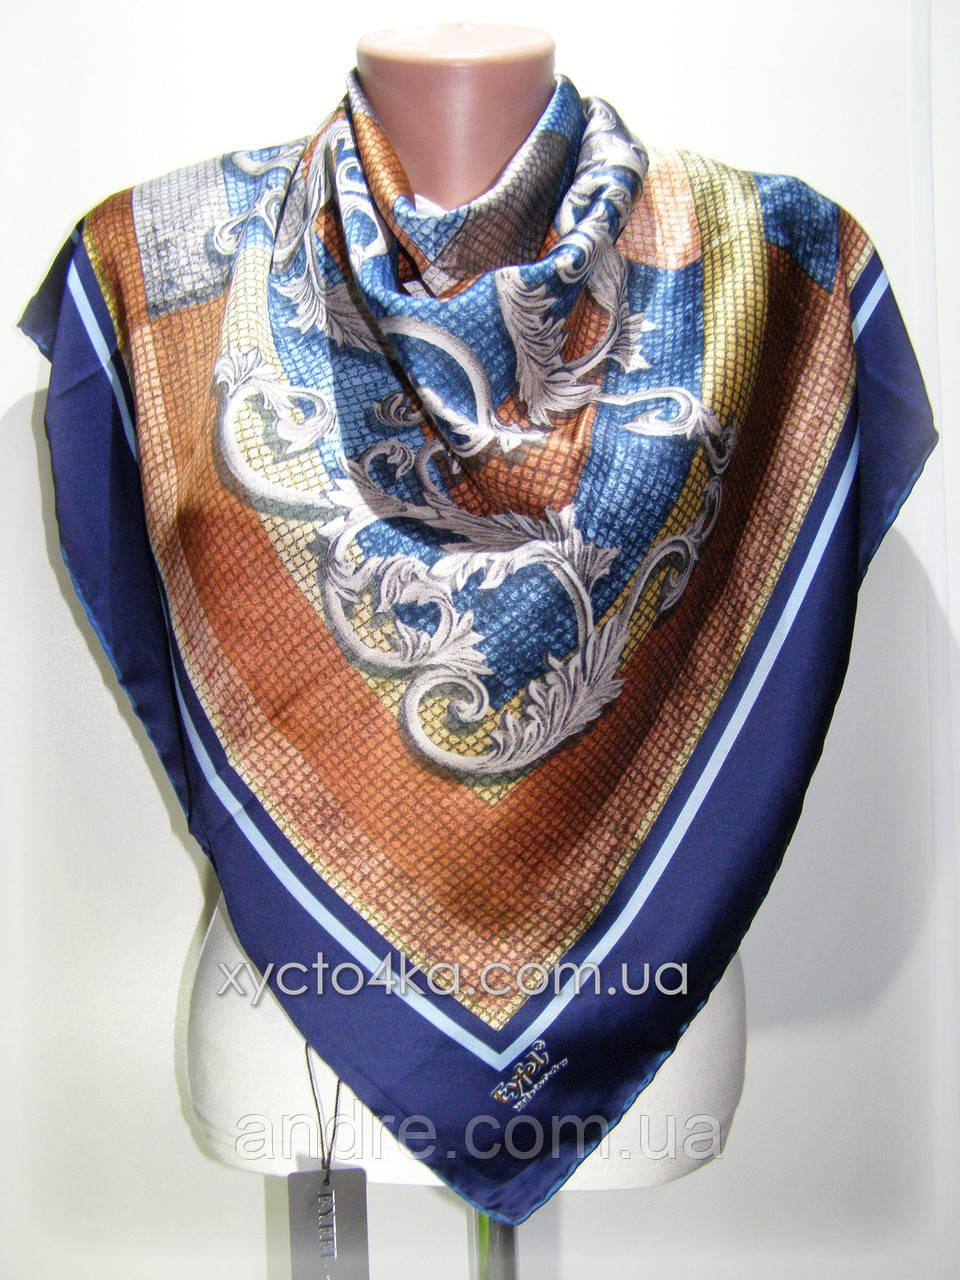 Атласный платок Авангард, синий